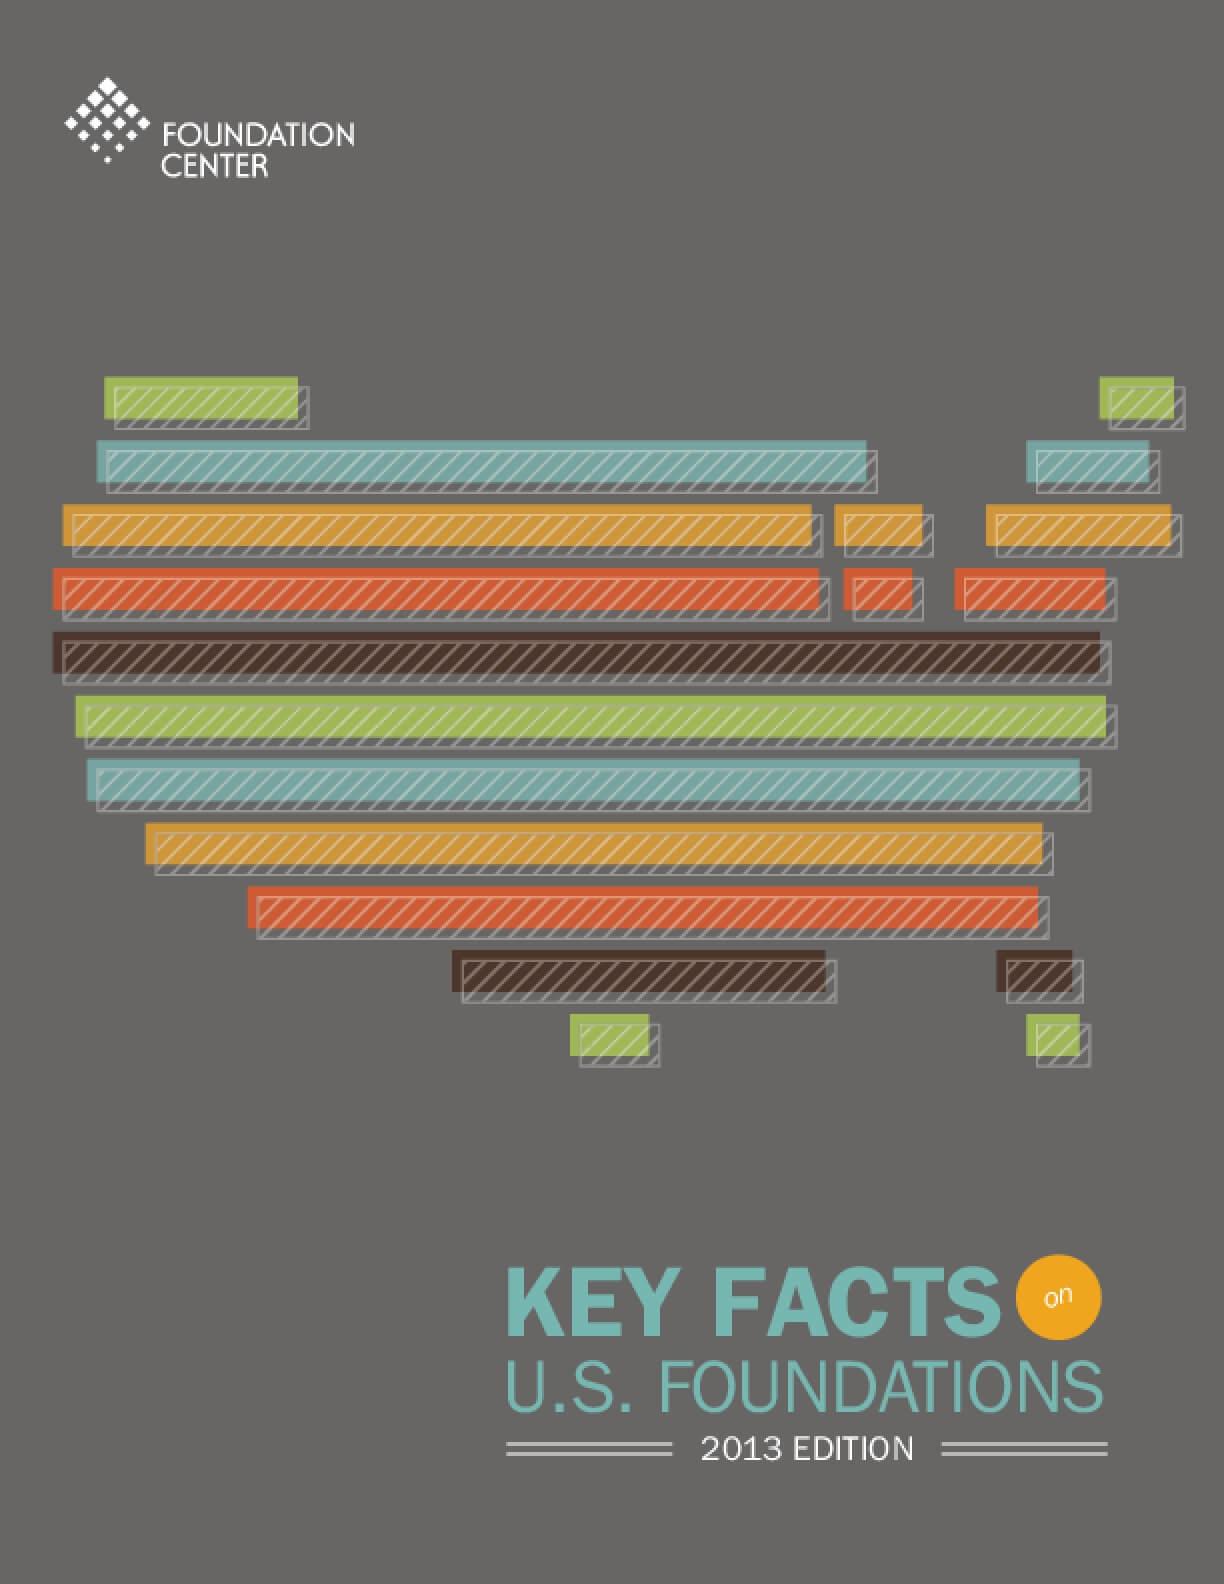 Key Facts on U.S. Foundations 2013